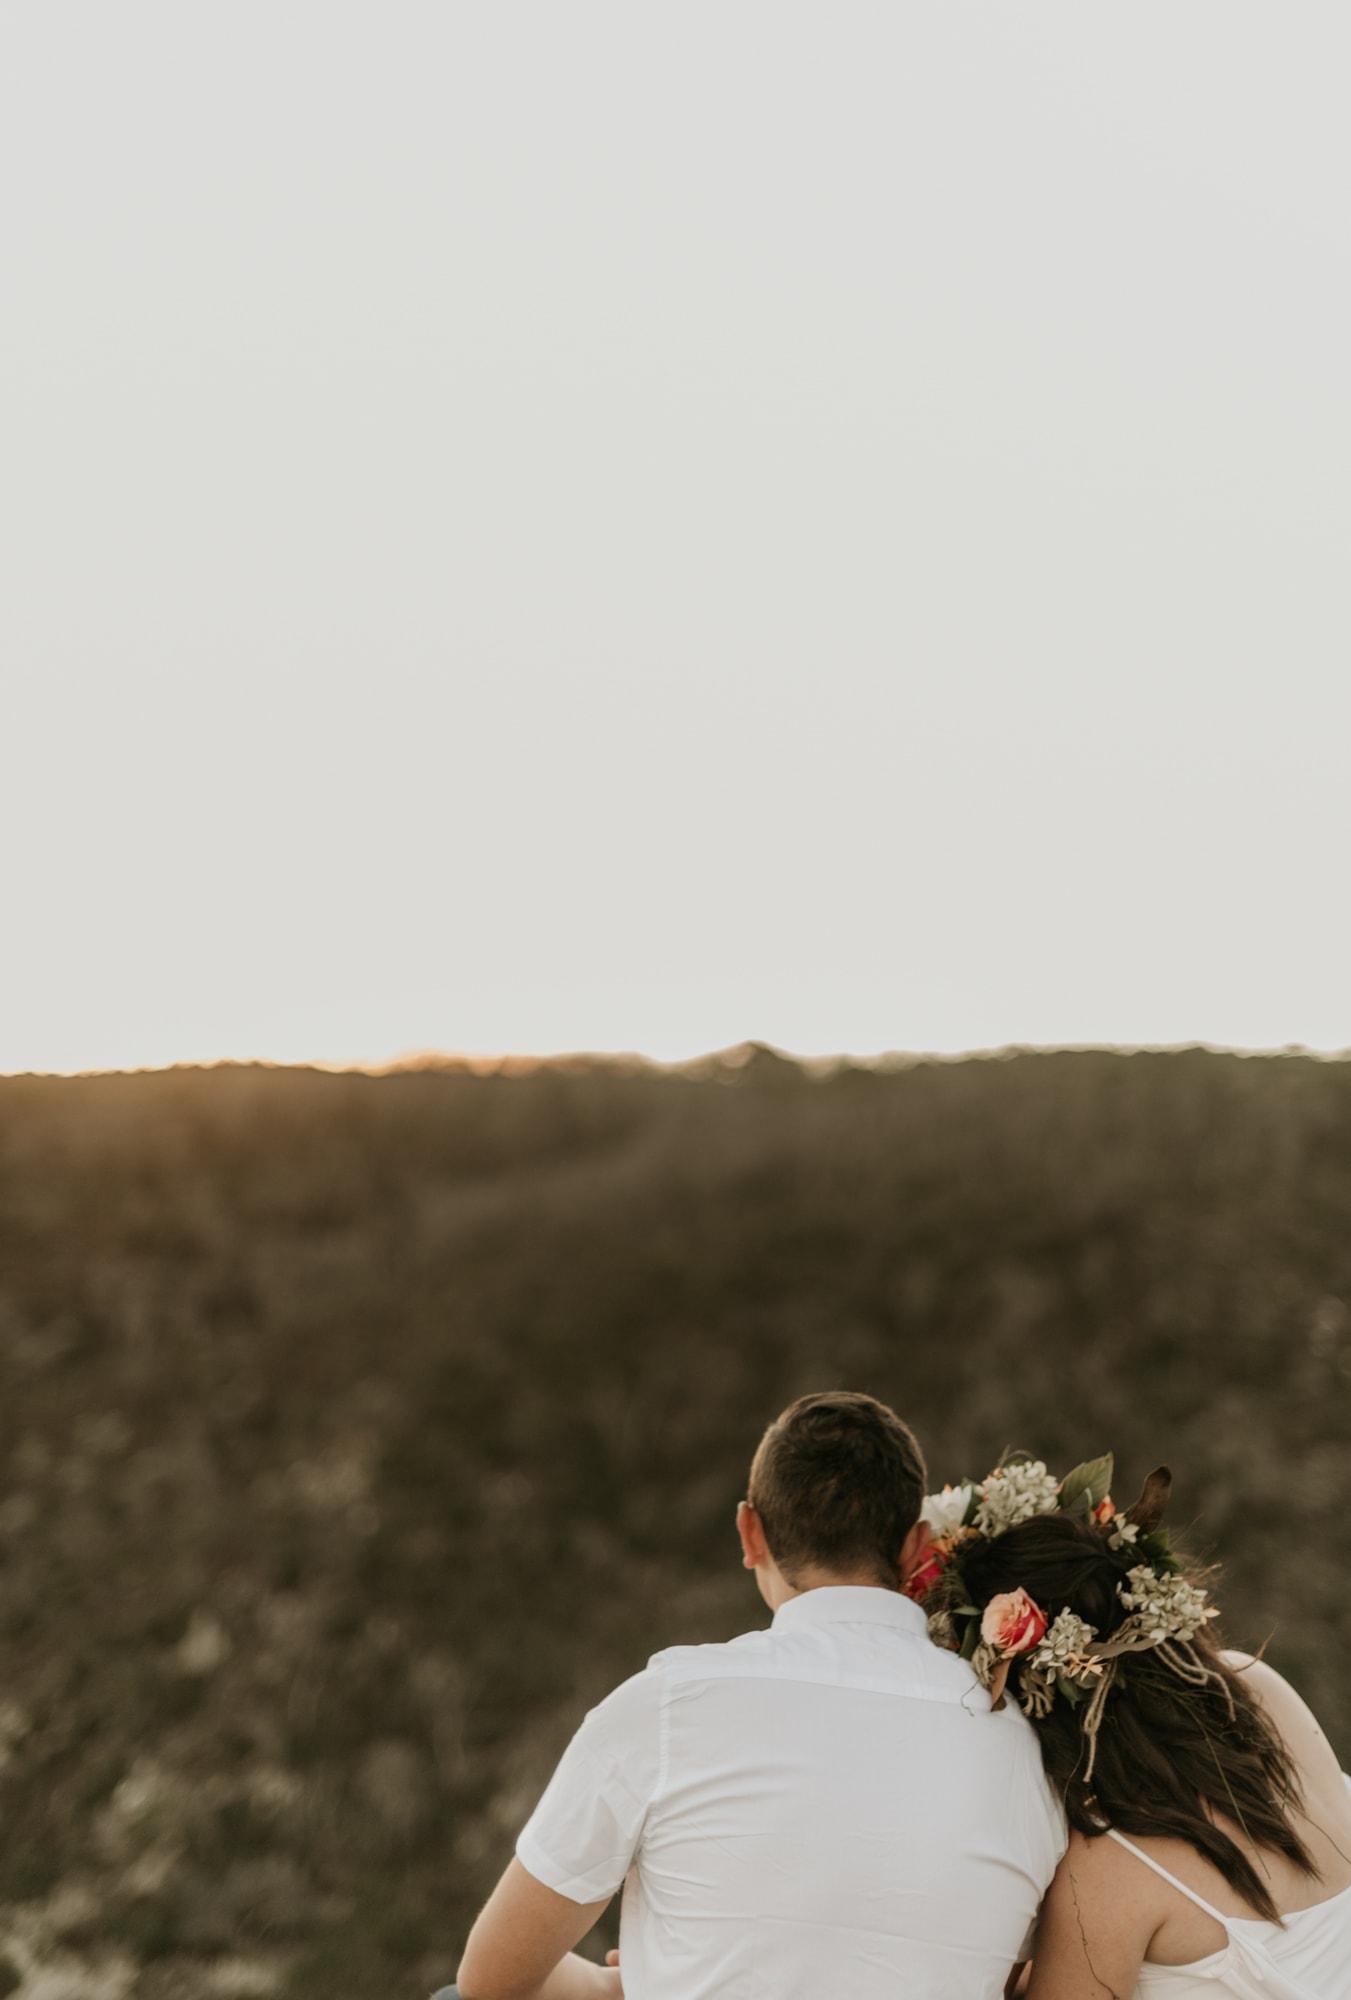 jesann-freddie-kranshoek-engagement-June-Richards-Photography-Destination-Weddings-Elopements-Garden-Route-23